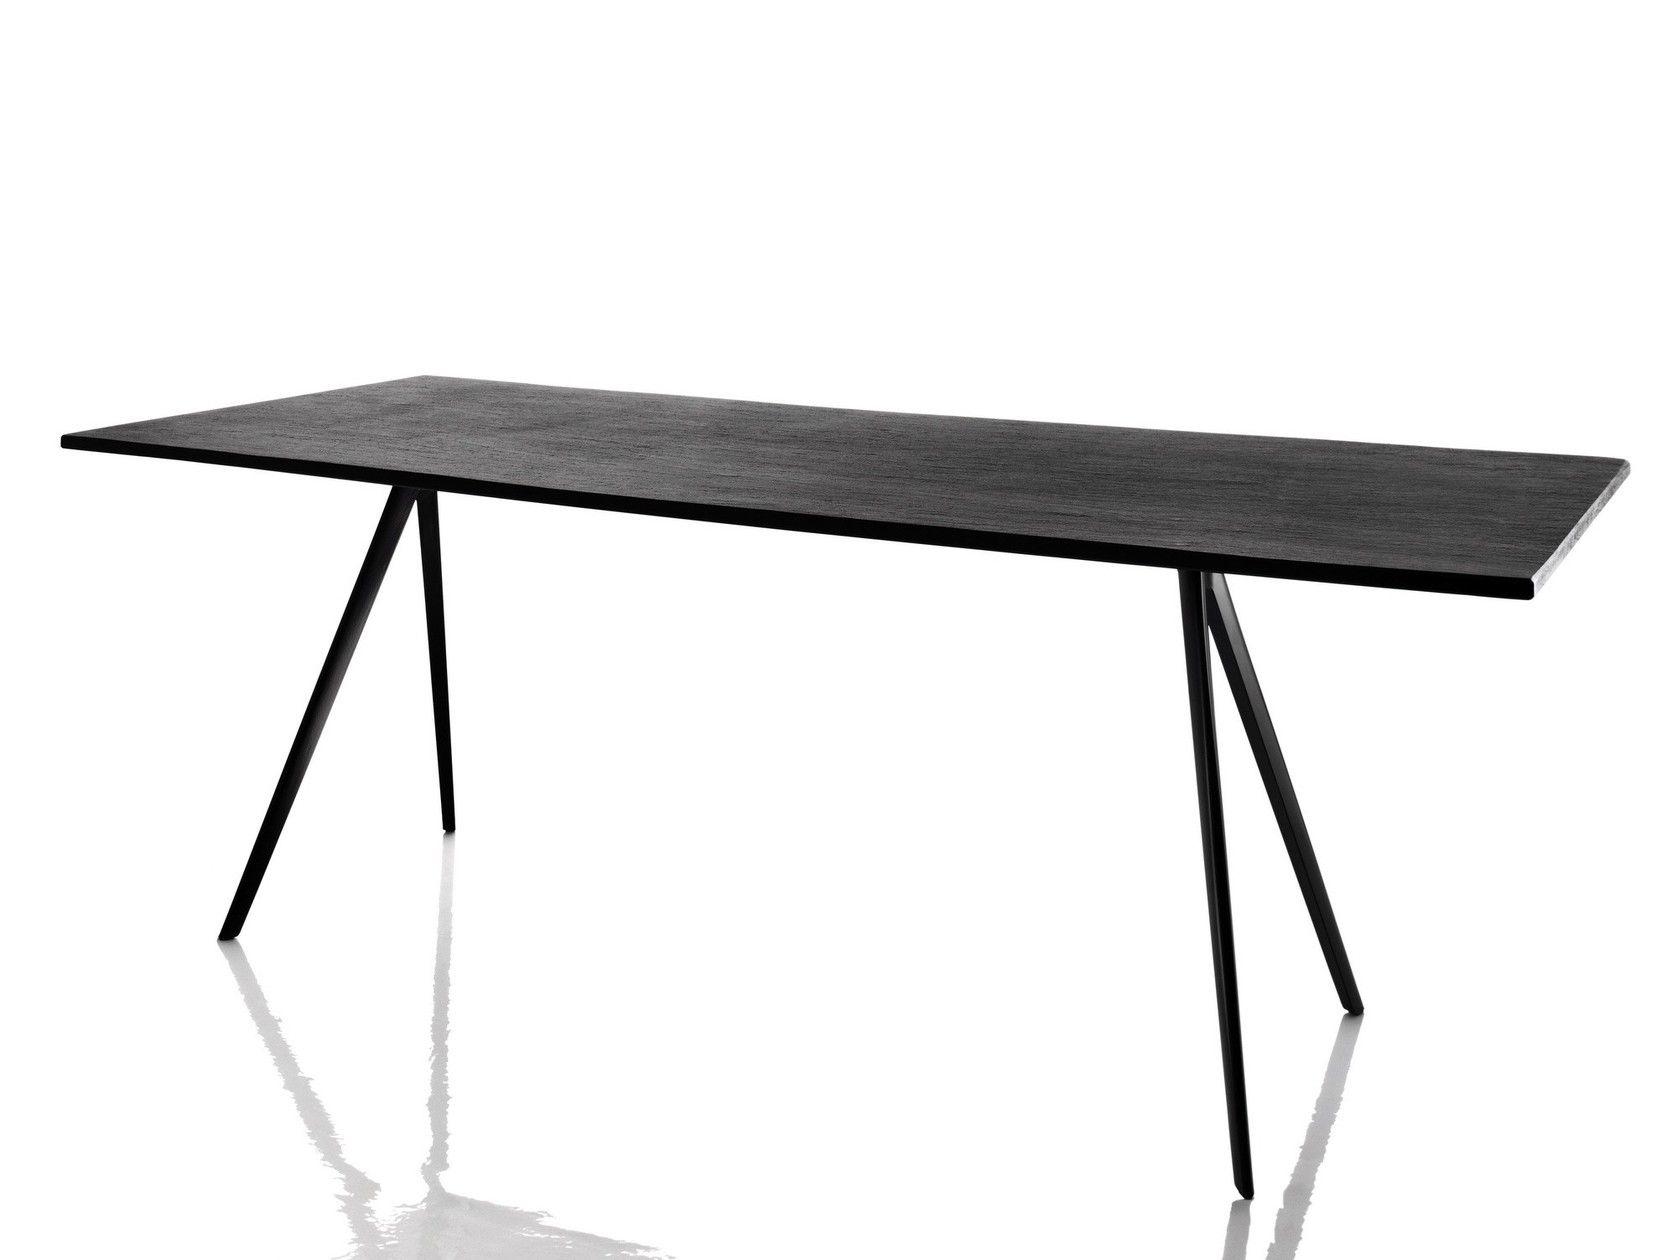 Baguette Slate Table By Magis Design Ronan Erwan Bouroullec